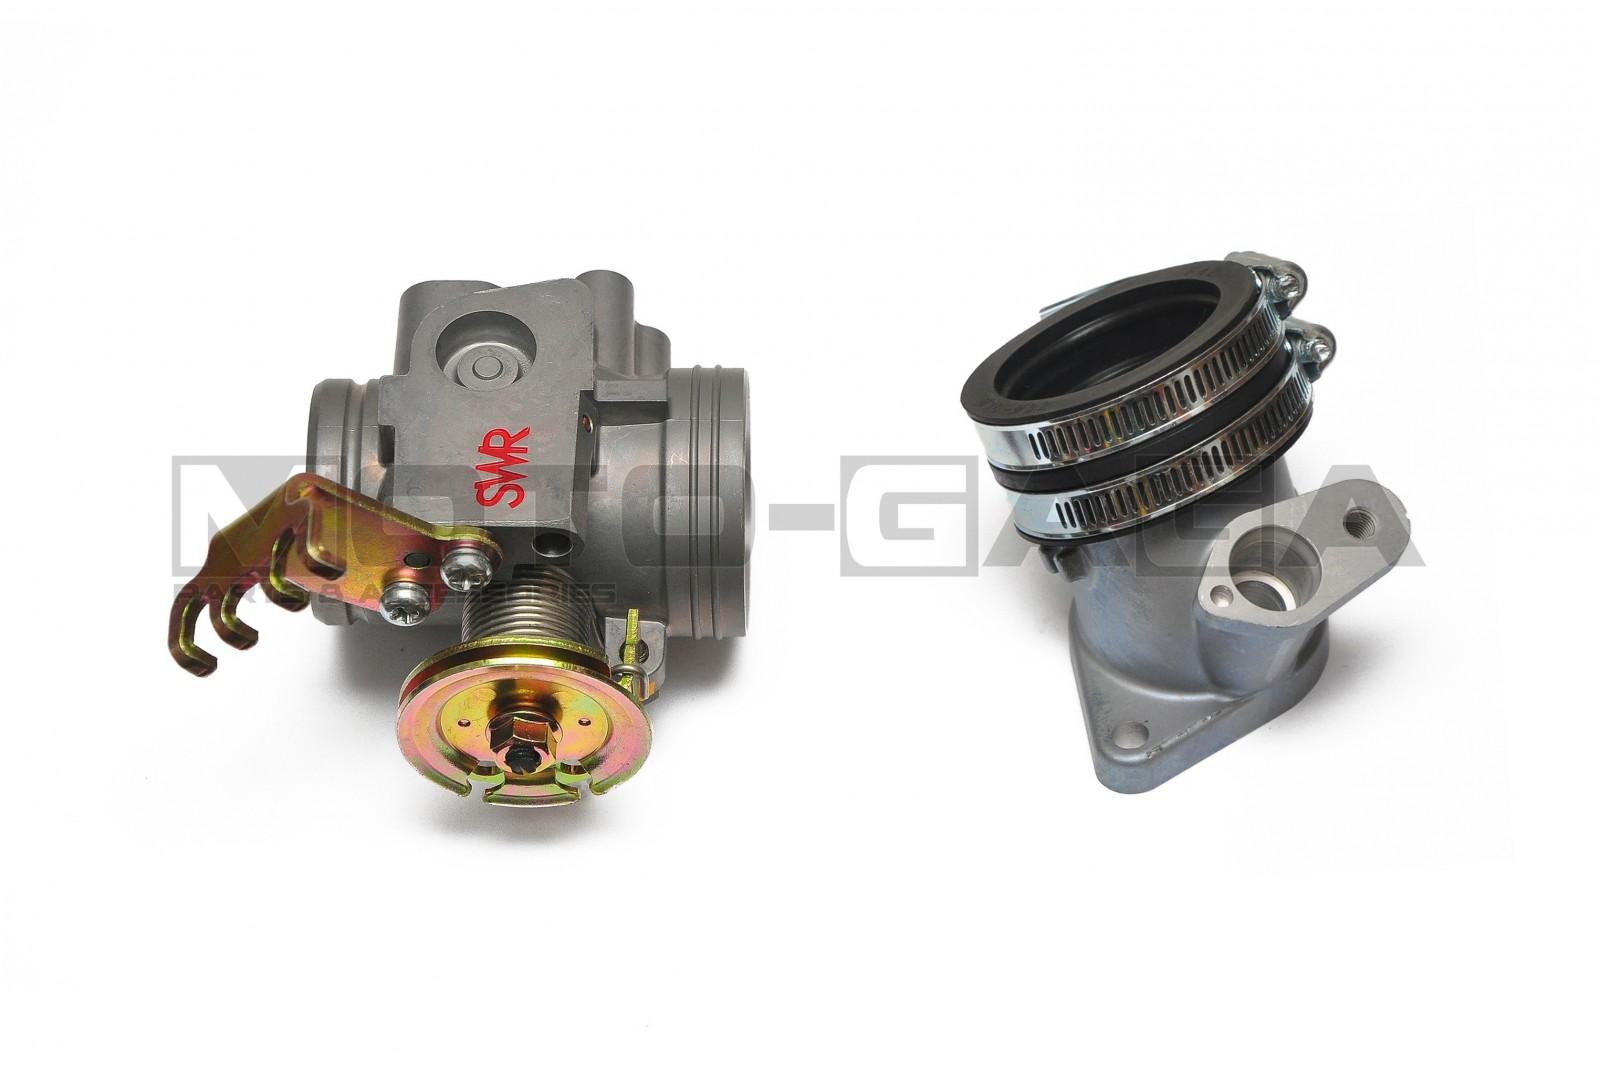 SWR Sunworld Racing Throttle Body - Yamaha Y15ZR/Jupiter MX King/Crypton  X/Spark/Exciter/Sniper T150/Fz150i Vixion 32/34/36mm Size 36mm